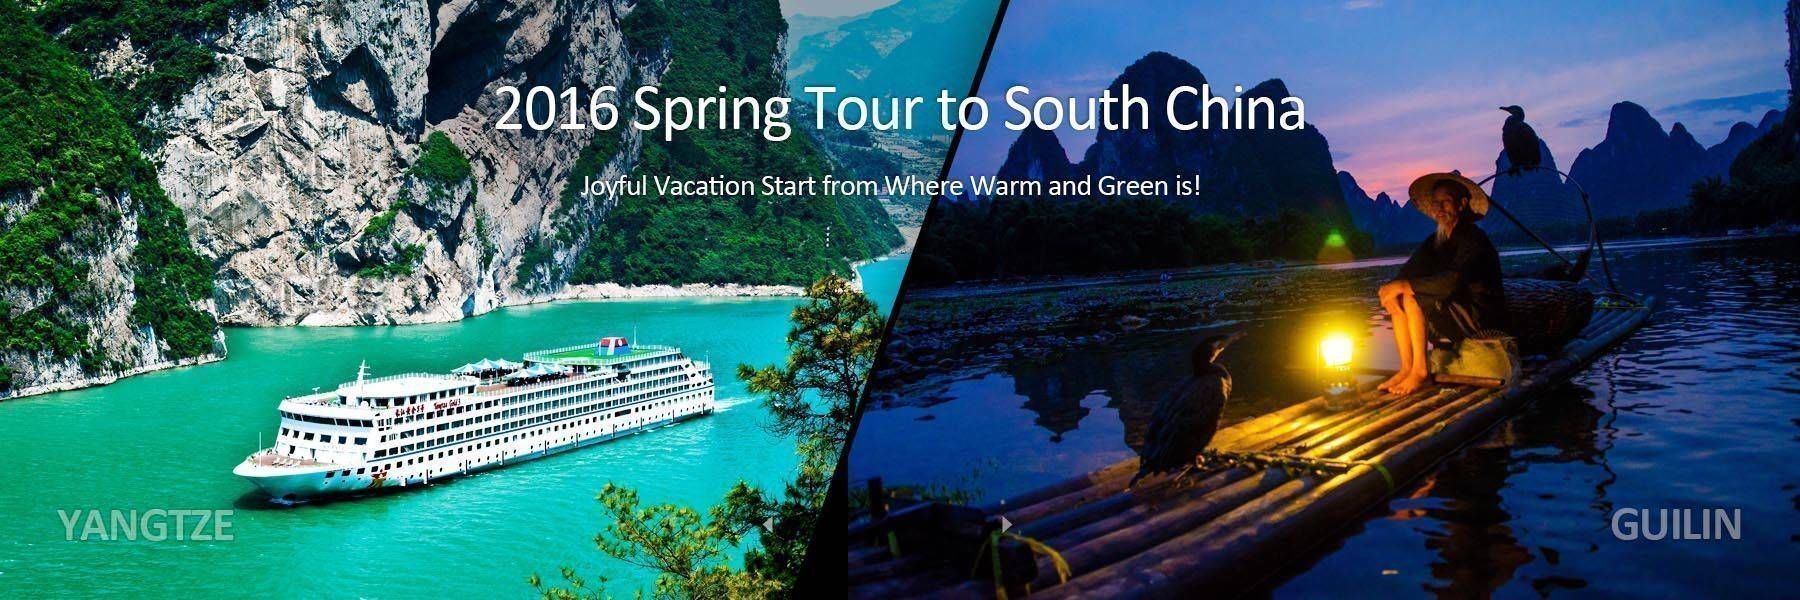 2016 Spring Tour